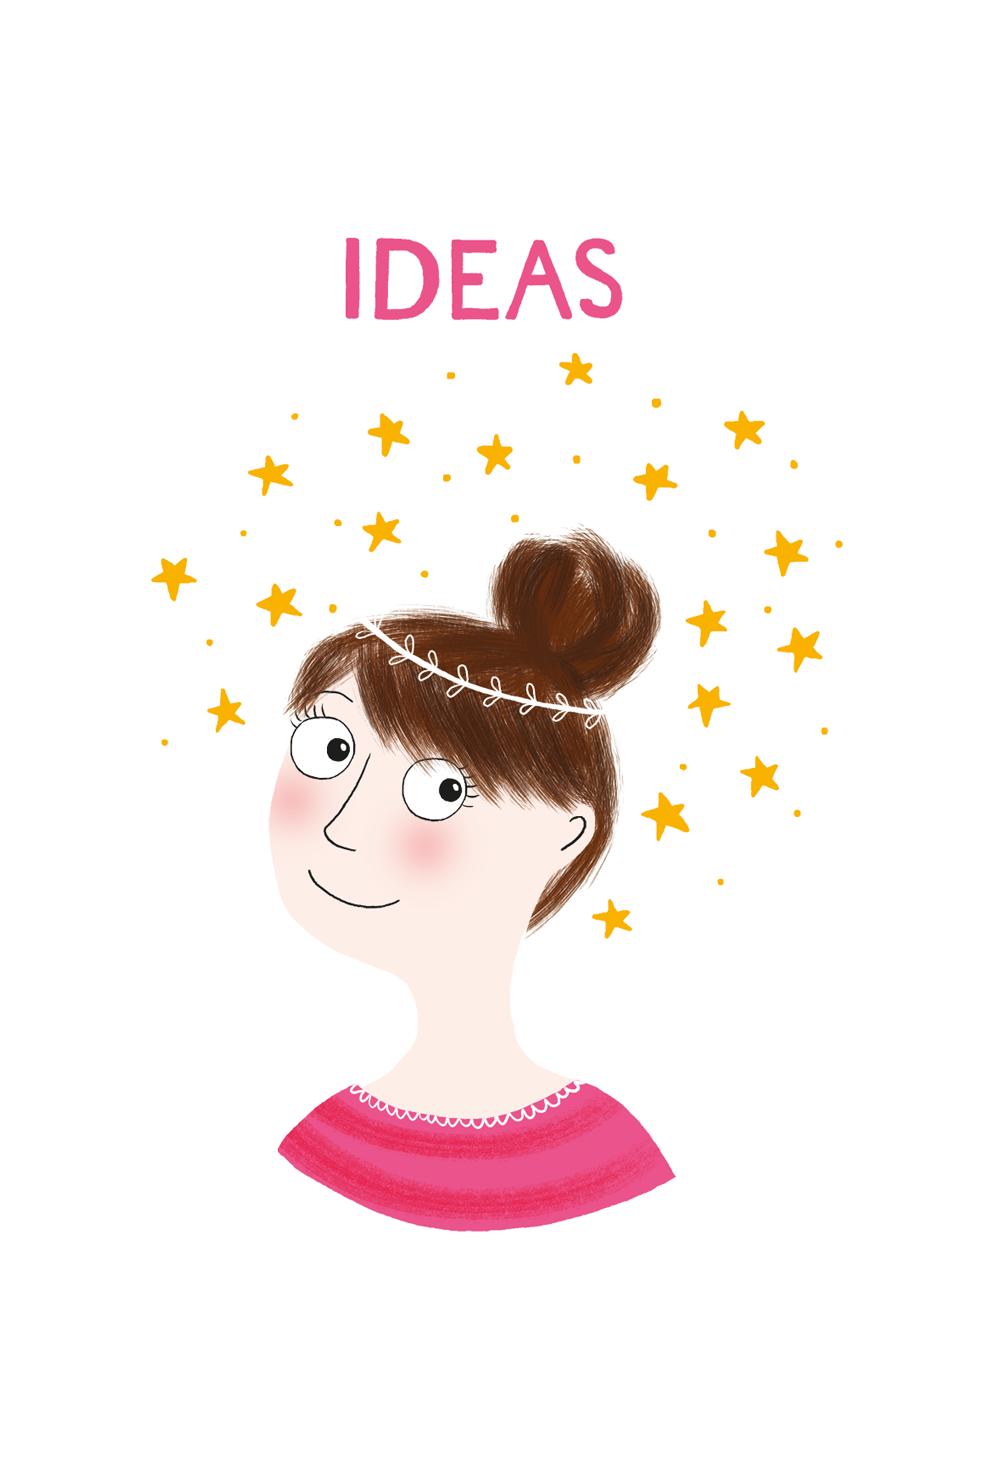 ideasandstars_notebook.png